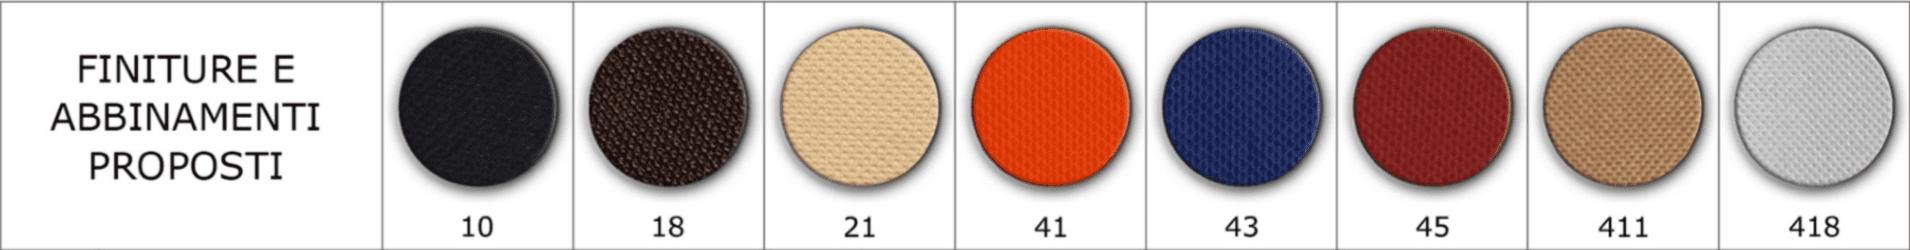 colori tele generale